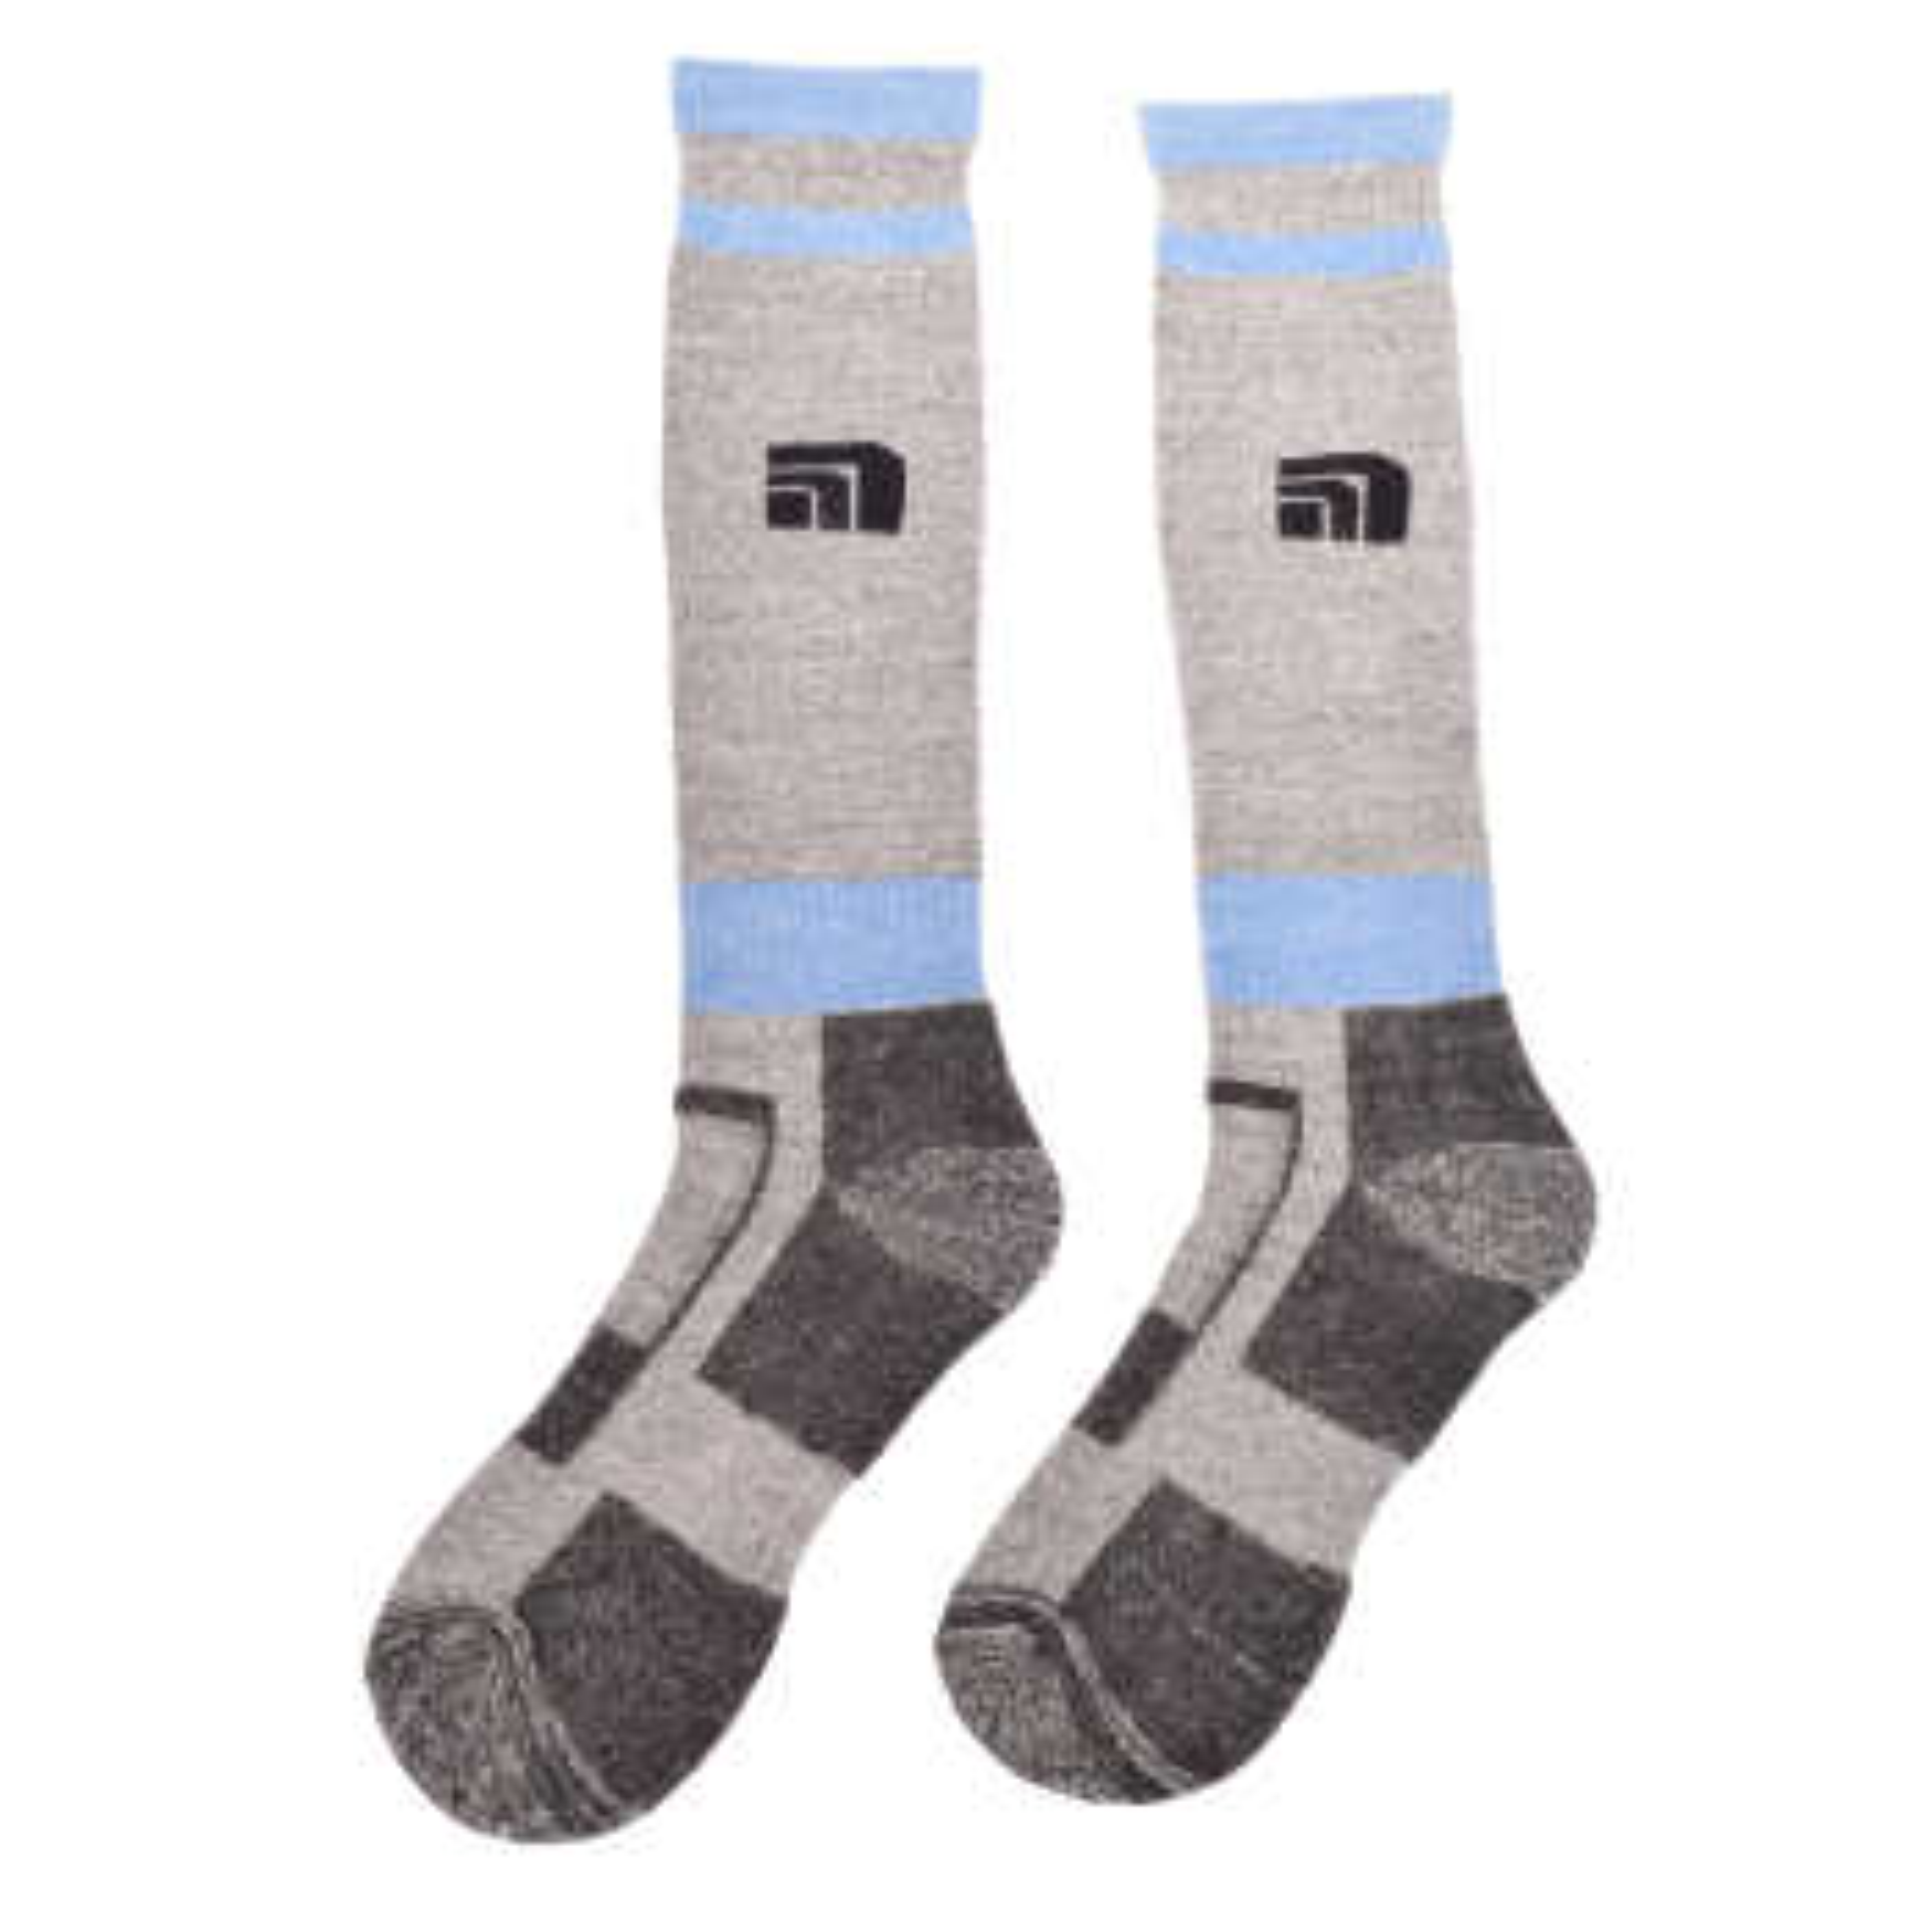 جوراب مردانه نورث فیس مدل Trekking | The North Face Trekking Socks For Men